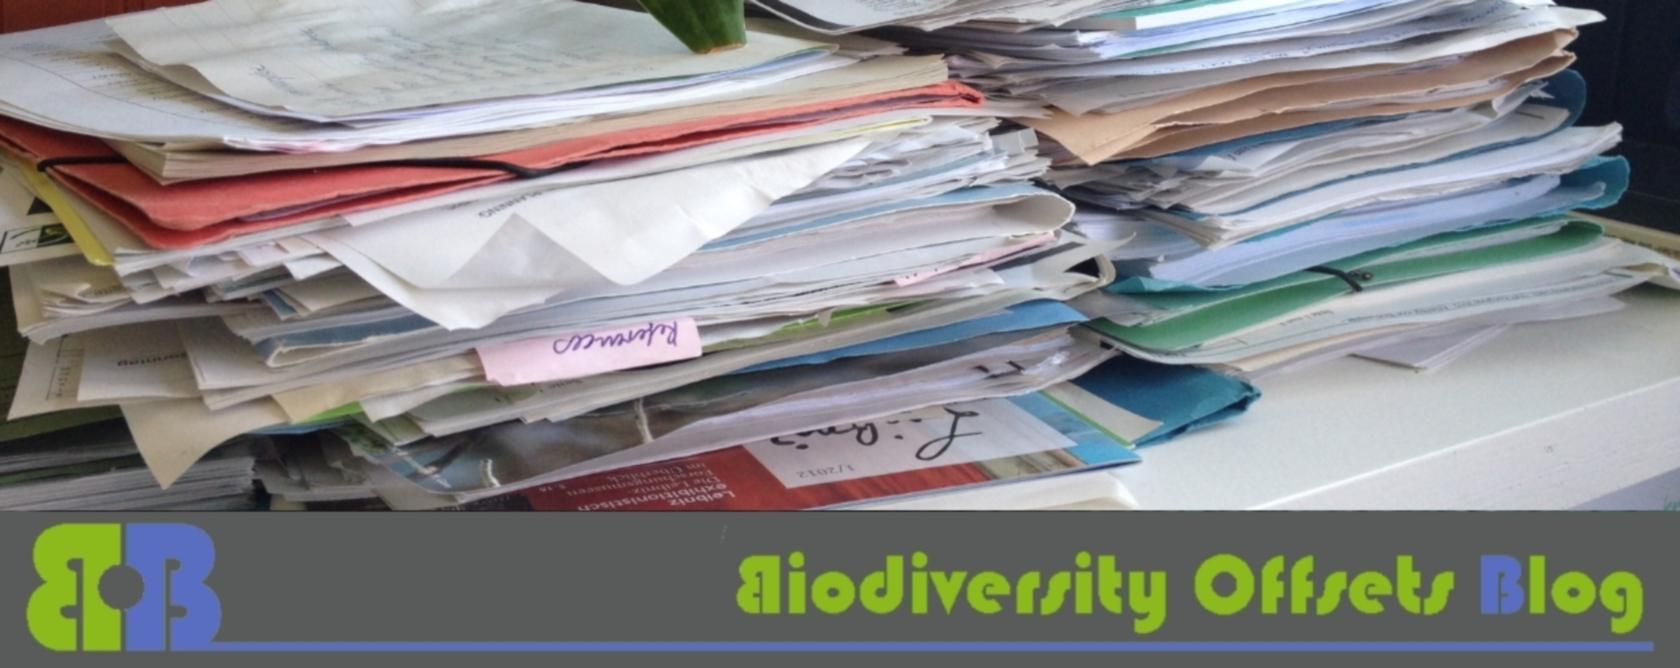 Biodiversity Offsets Blog Logo_hellgruen_Literature_1680